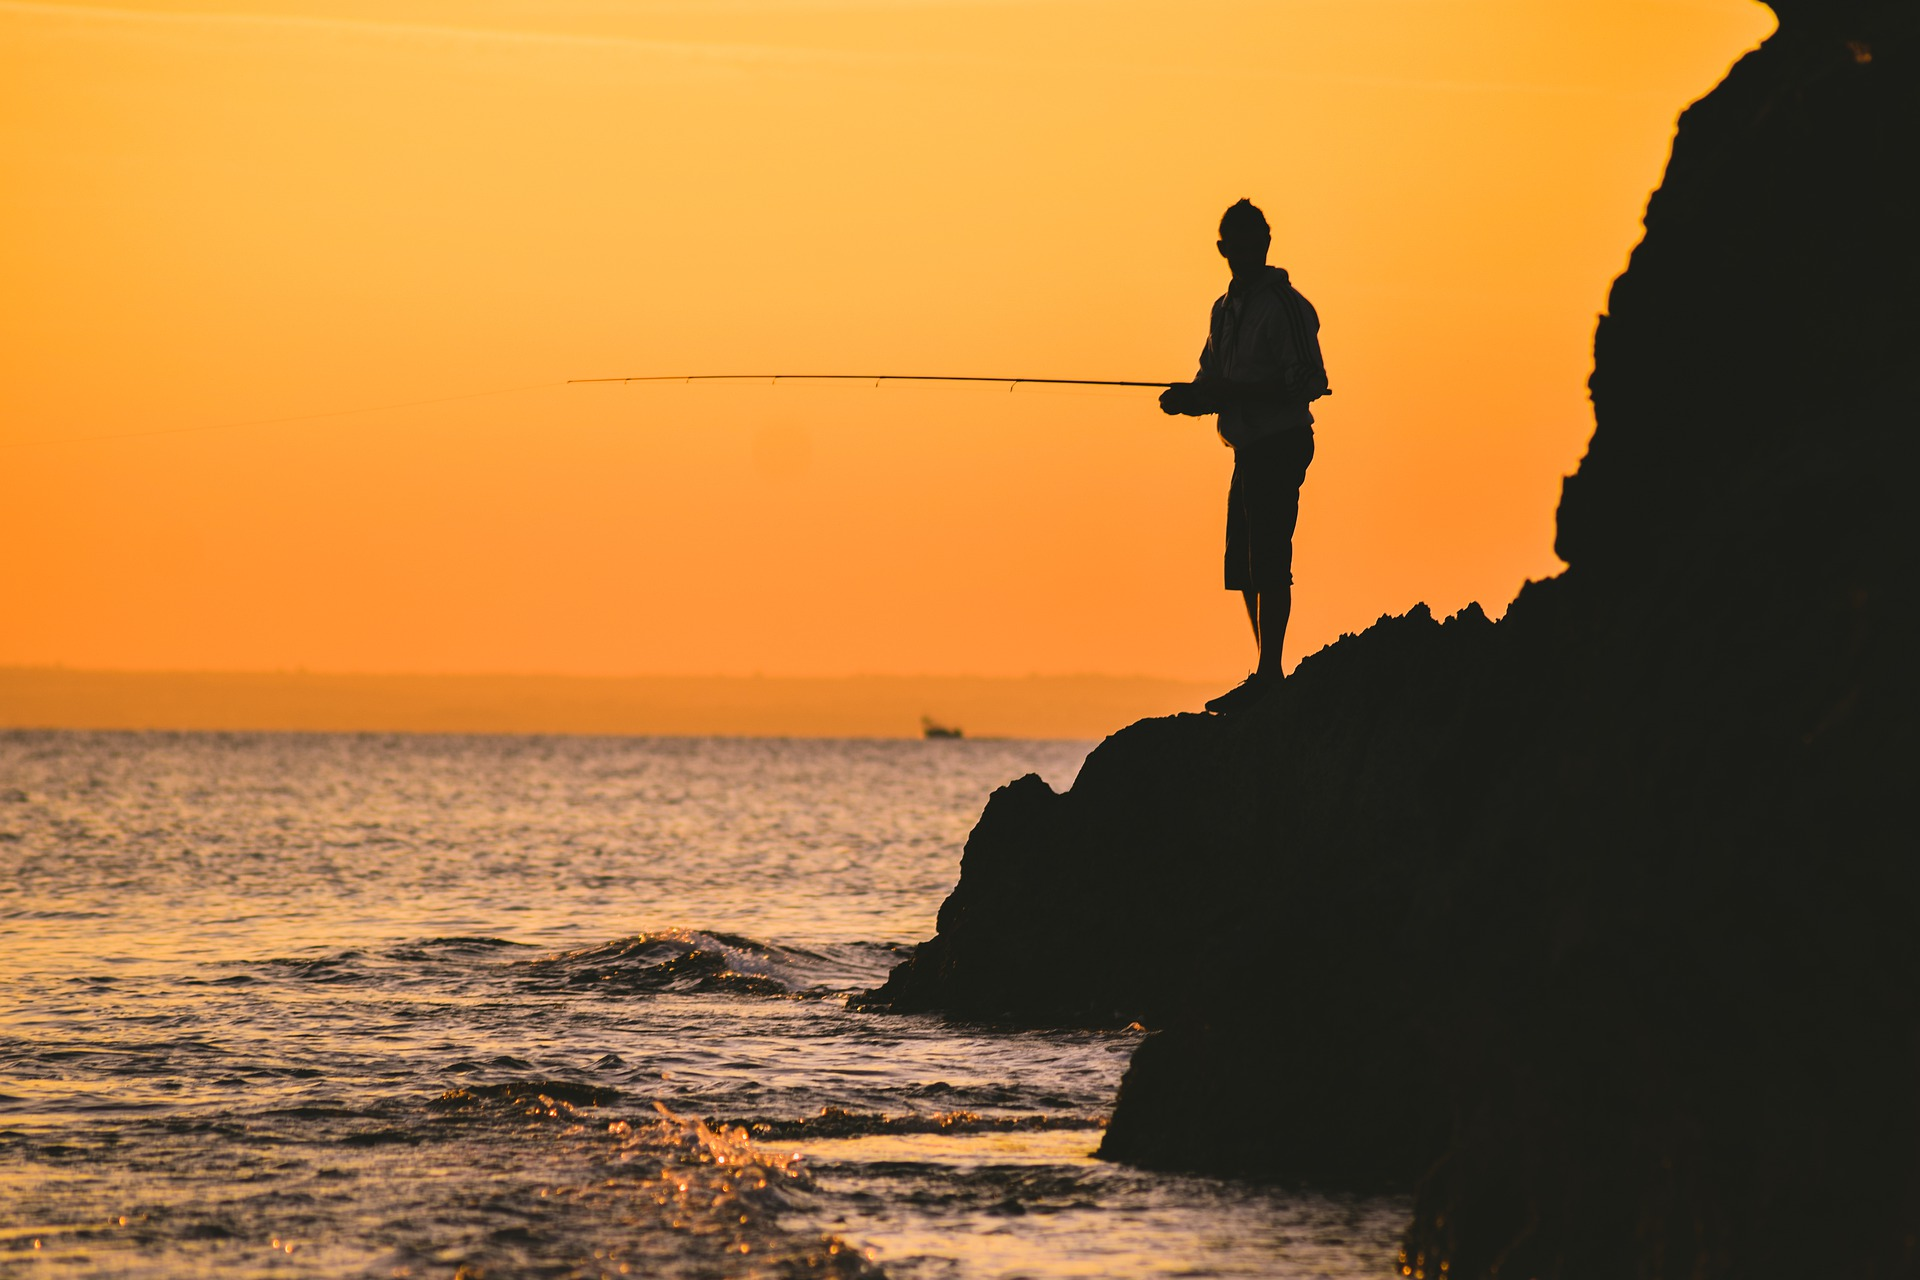 fisherman-4601744_1920